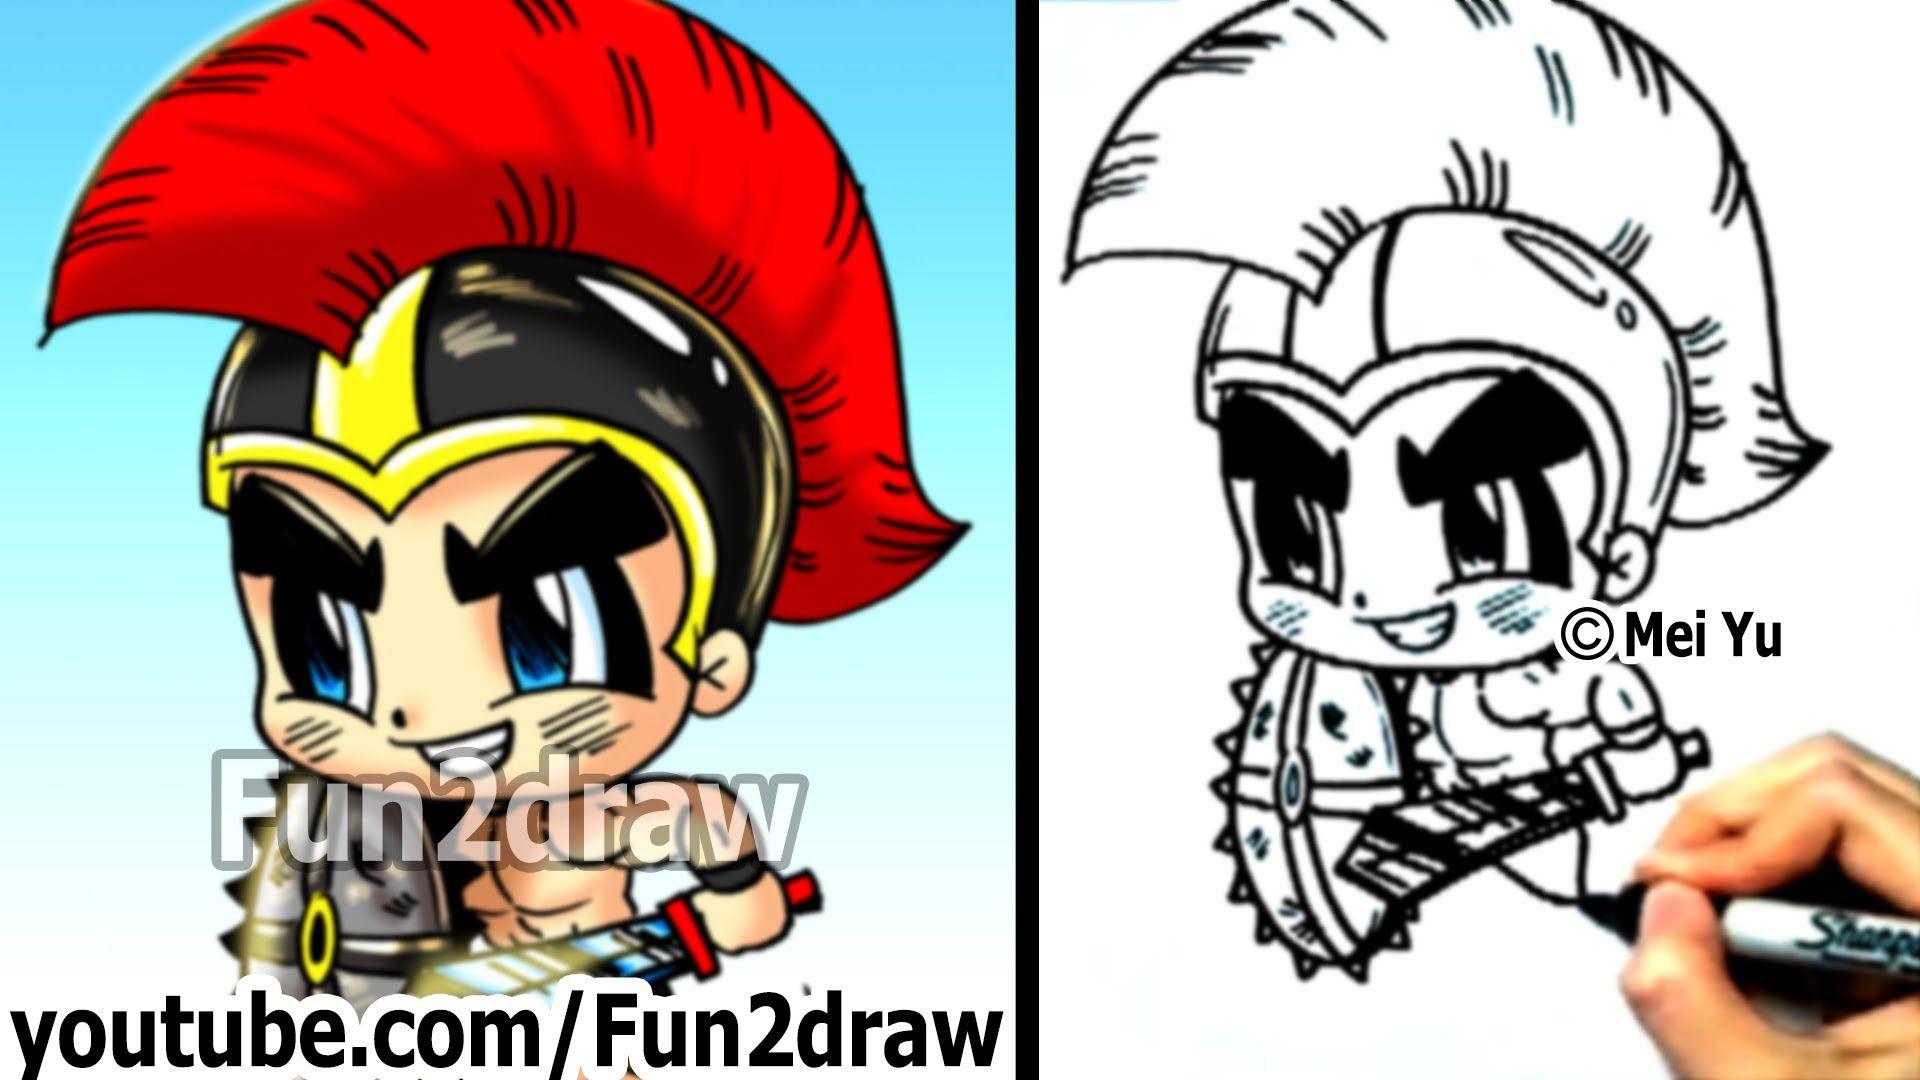 How To Draw Cartoon People Gladiator Warrior Fun Things To Draw Fu